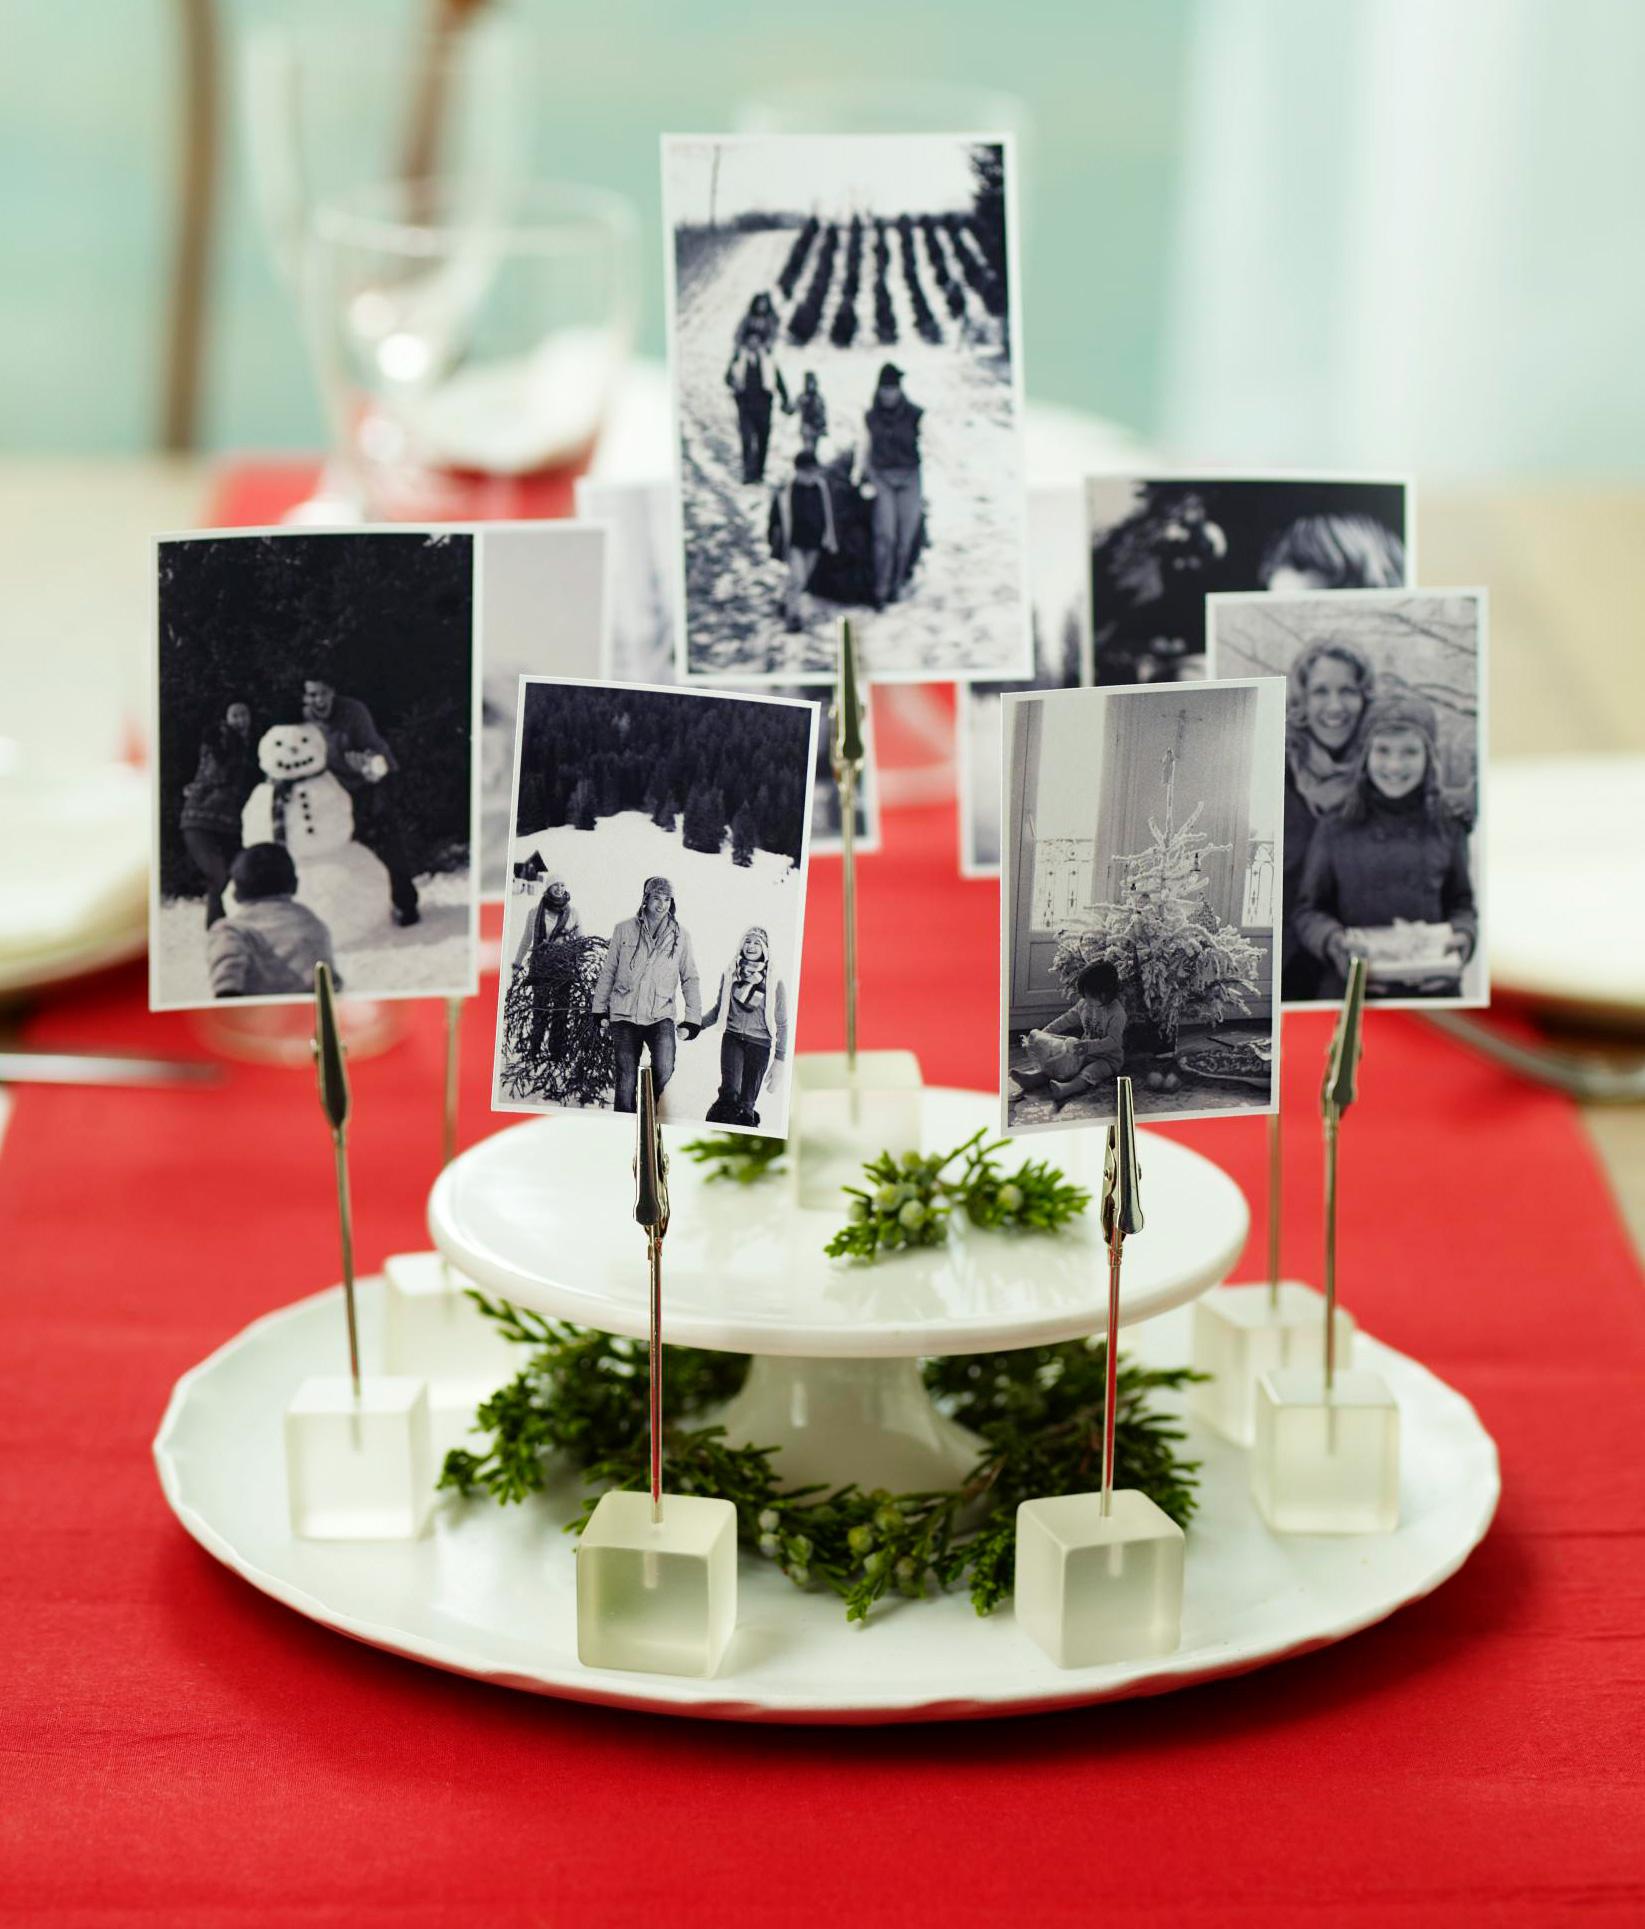 Christmas centerpiece ideas: old photos